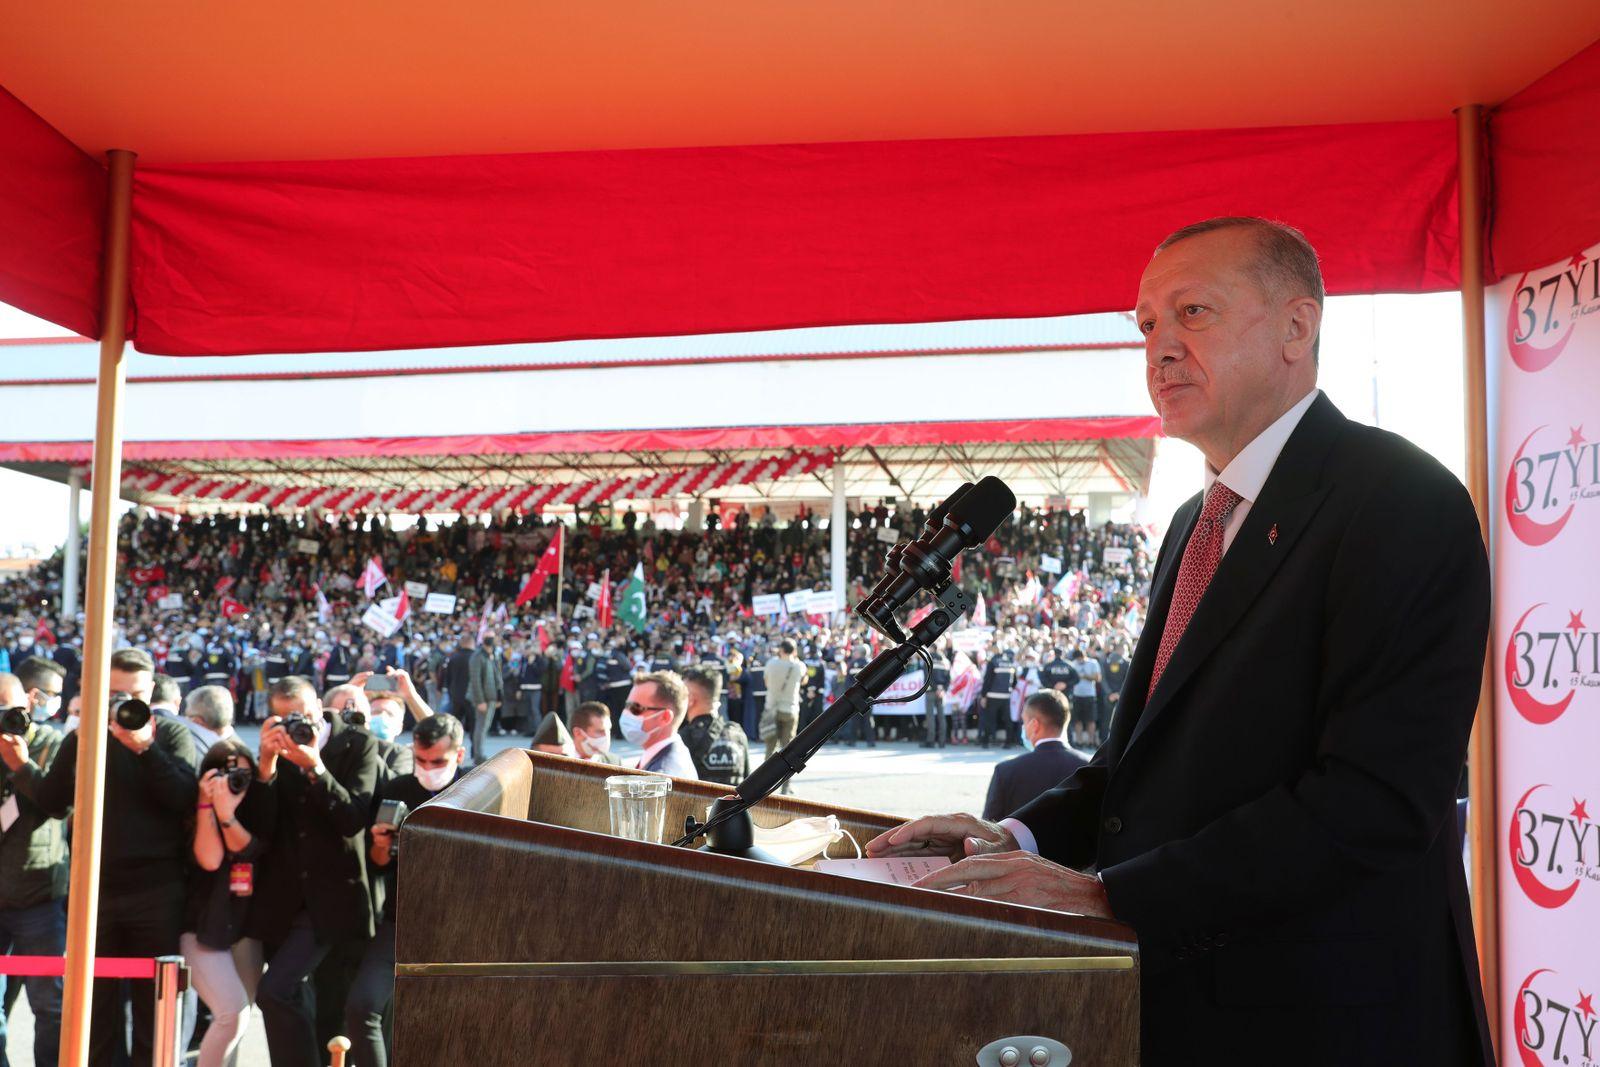 Turkish President Erdogan visits Turkish Cyprus, Nicosia - 15 Nov 2020